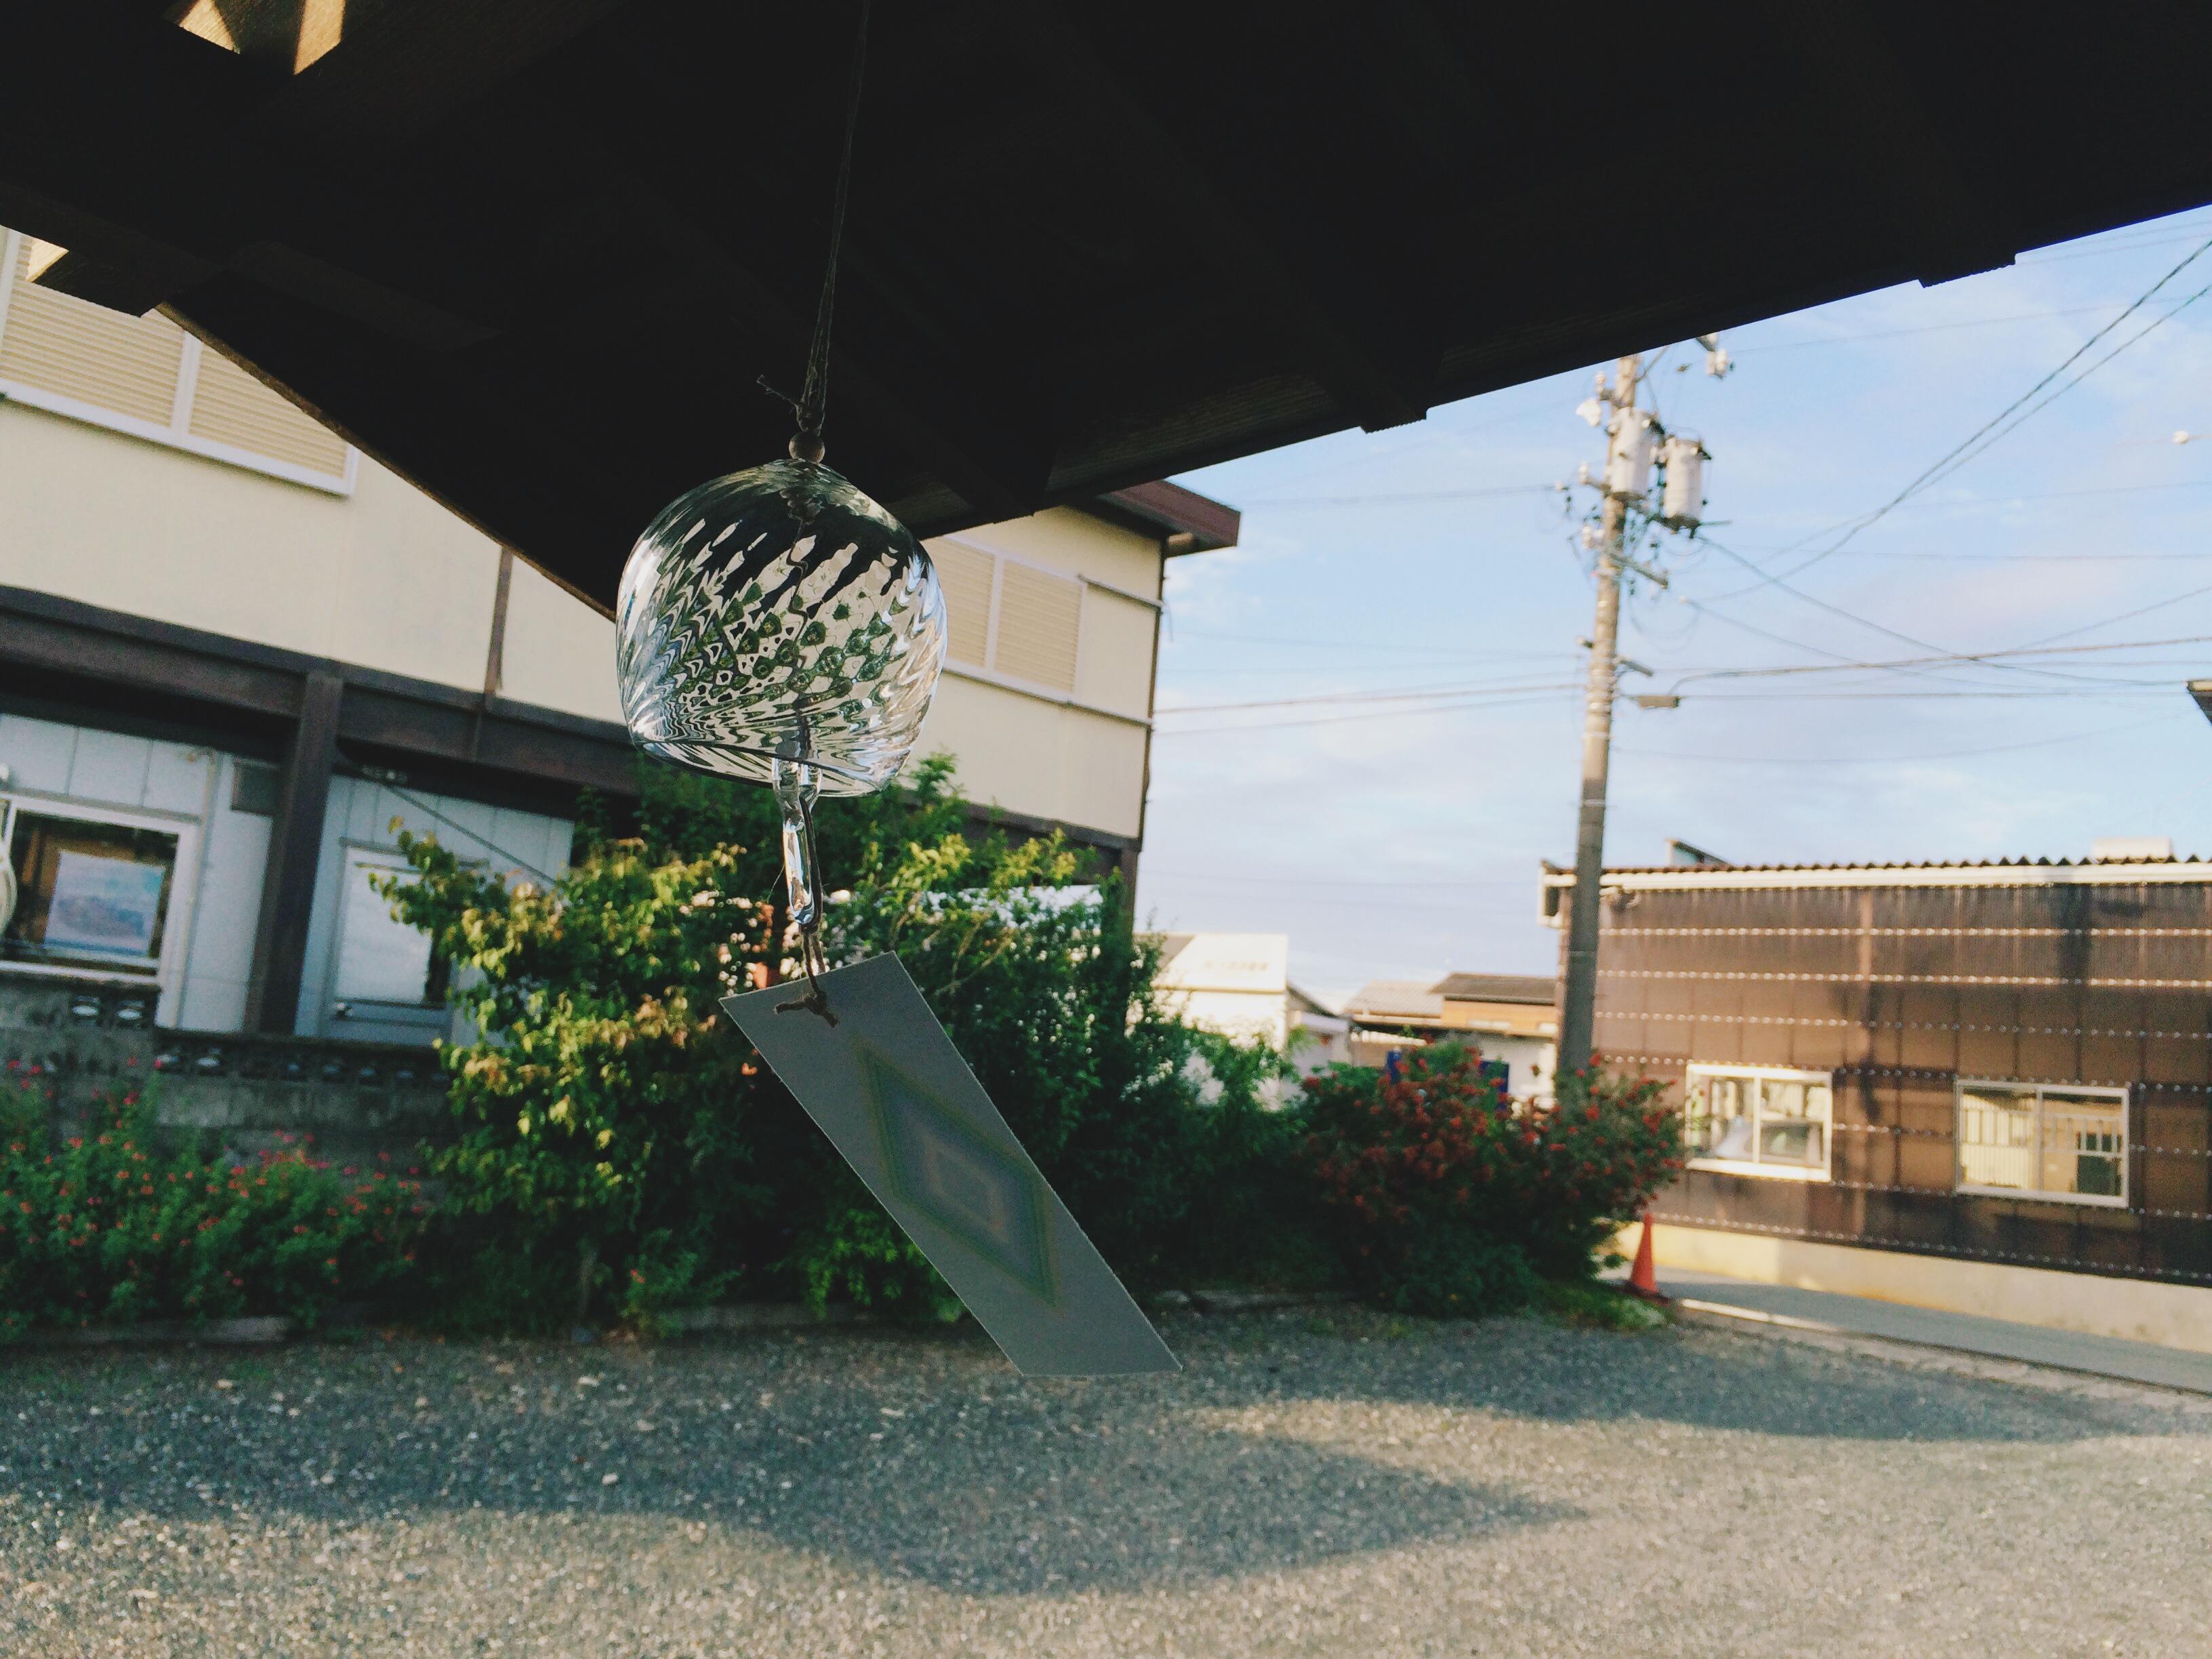 IMG_6611[1]